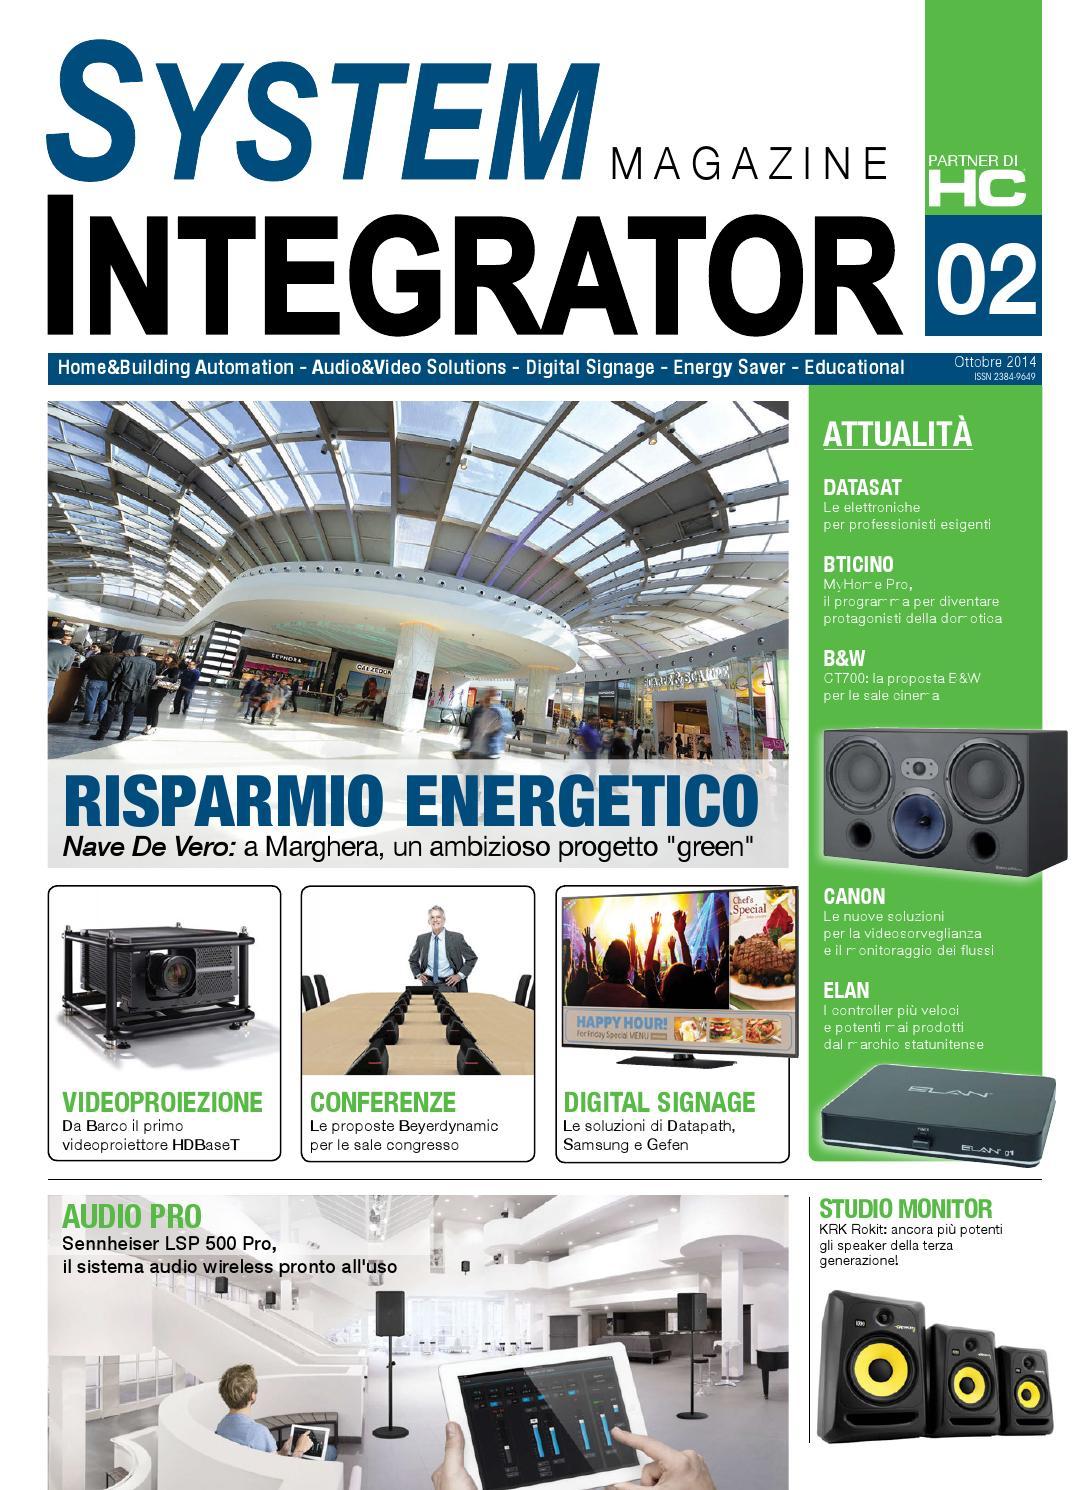 System Integrator Magazine  02 by SIM System Integrator Magazine - issuu 179ca25b8ba5